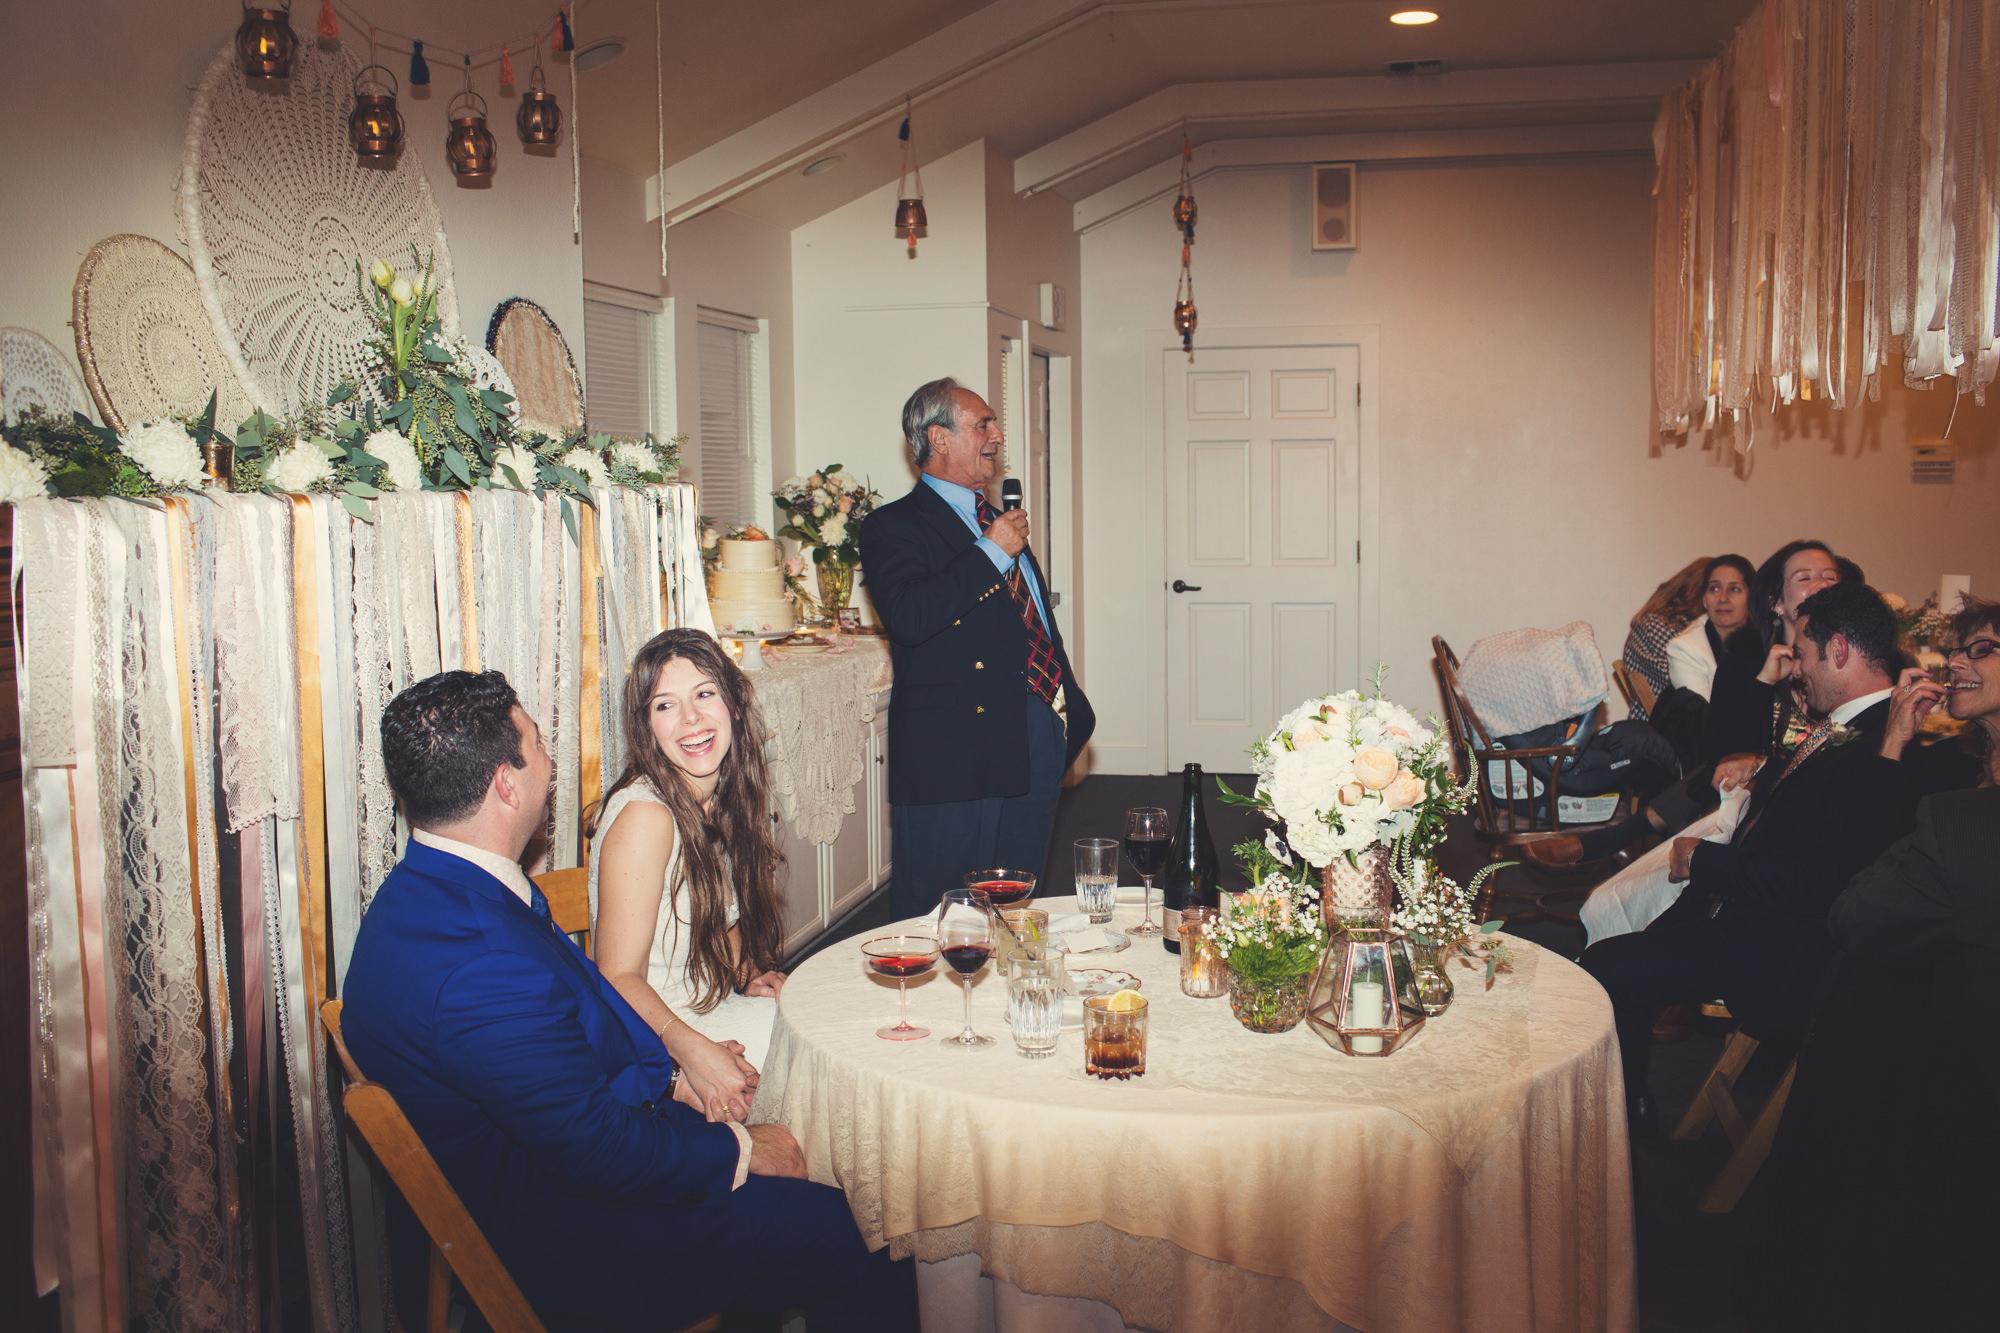 Little River Inn Wedding@Anne-Claire Brun 234